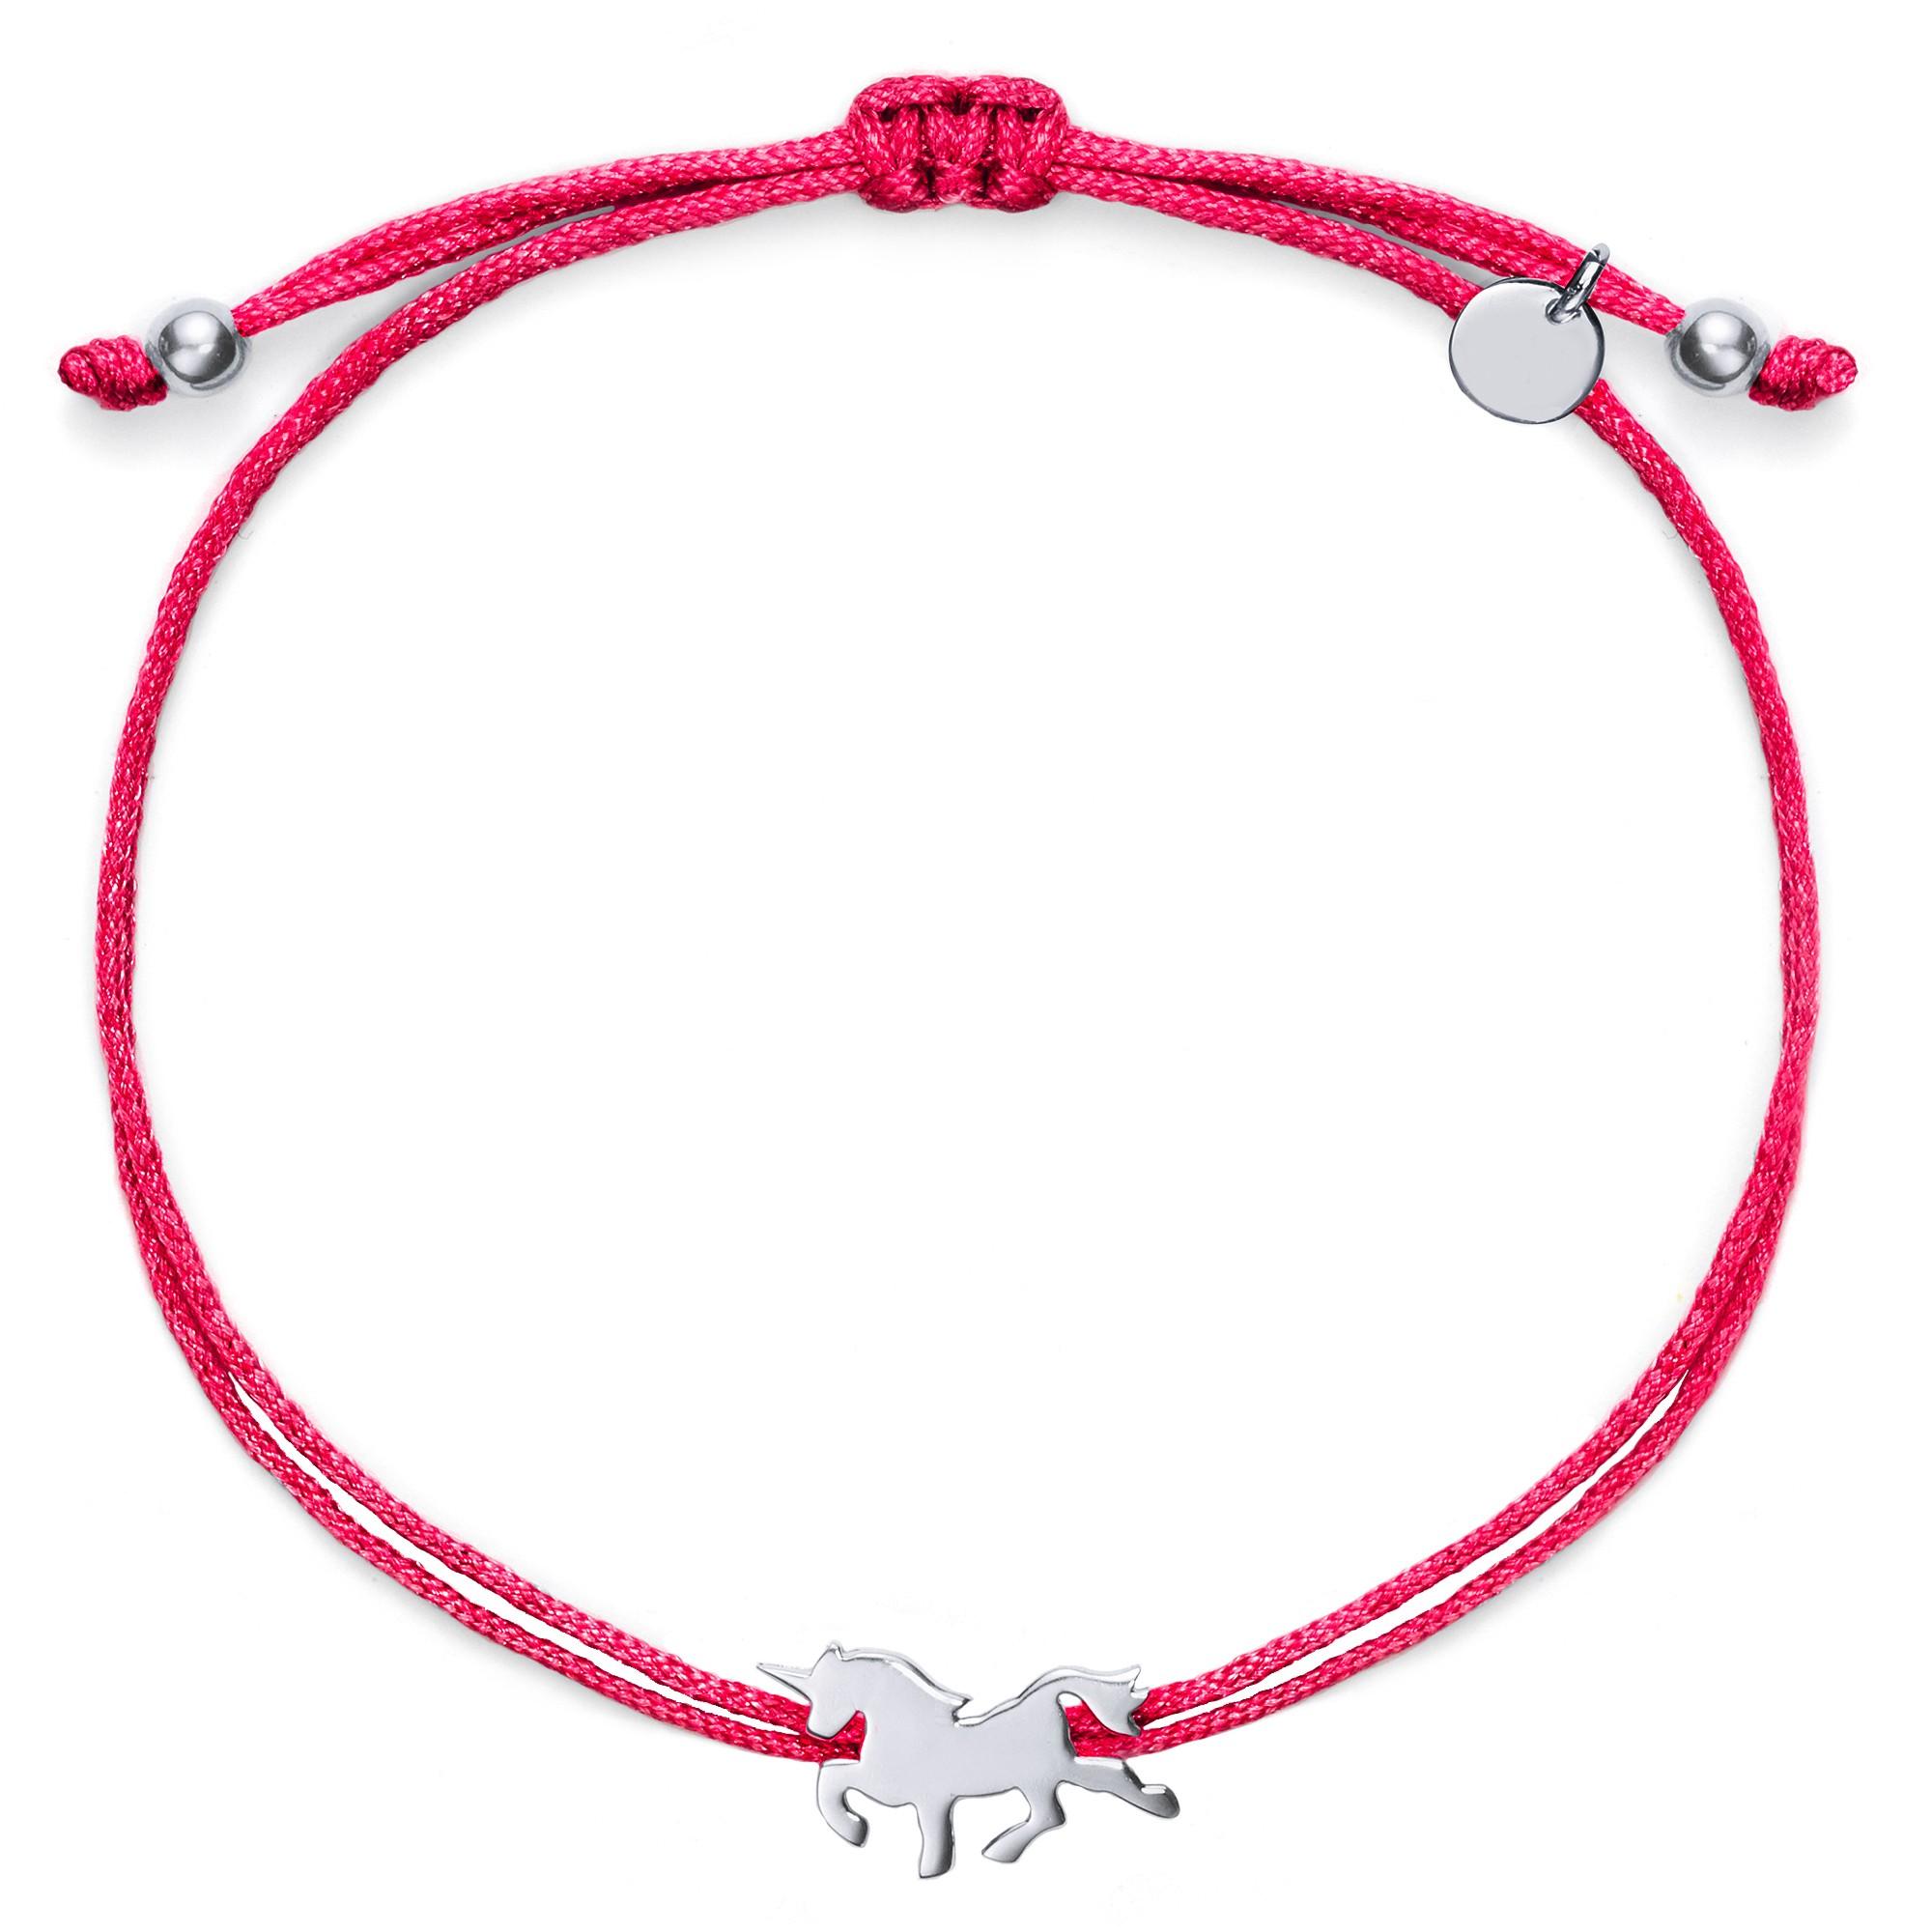 Bei Sterlingsilber Einhorn 925 Armband Online Kaufen qSVLpUzMG